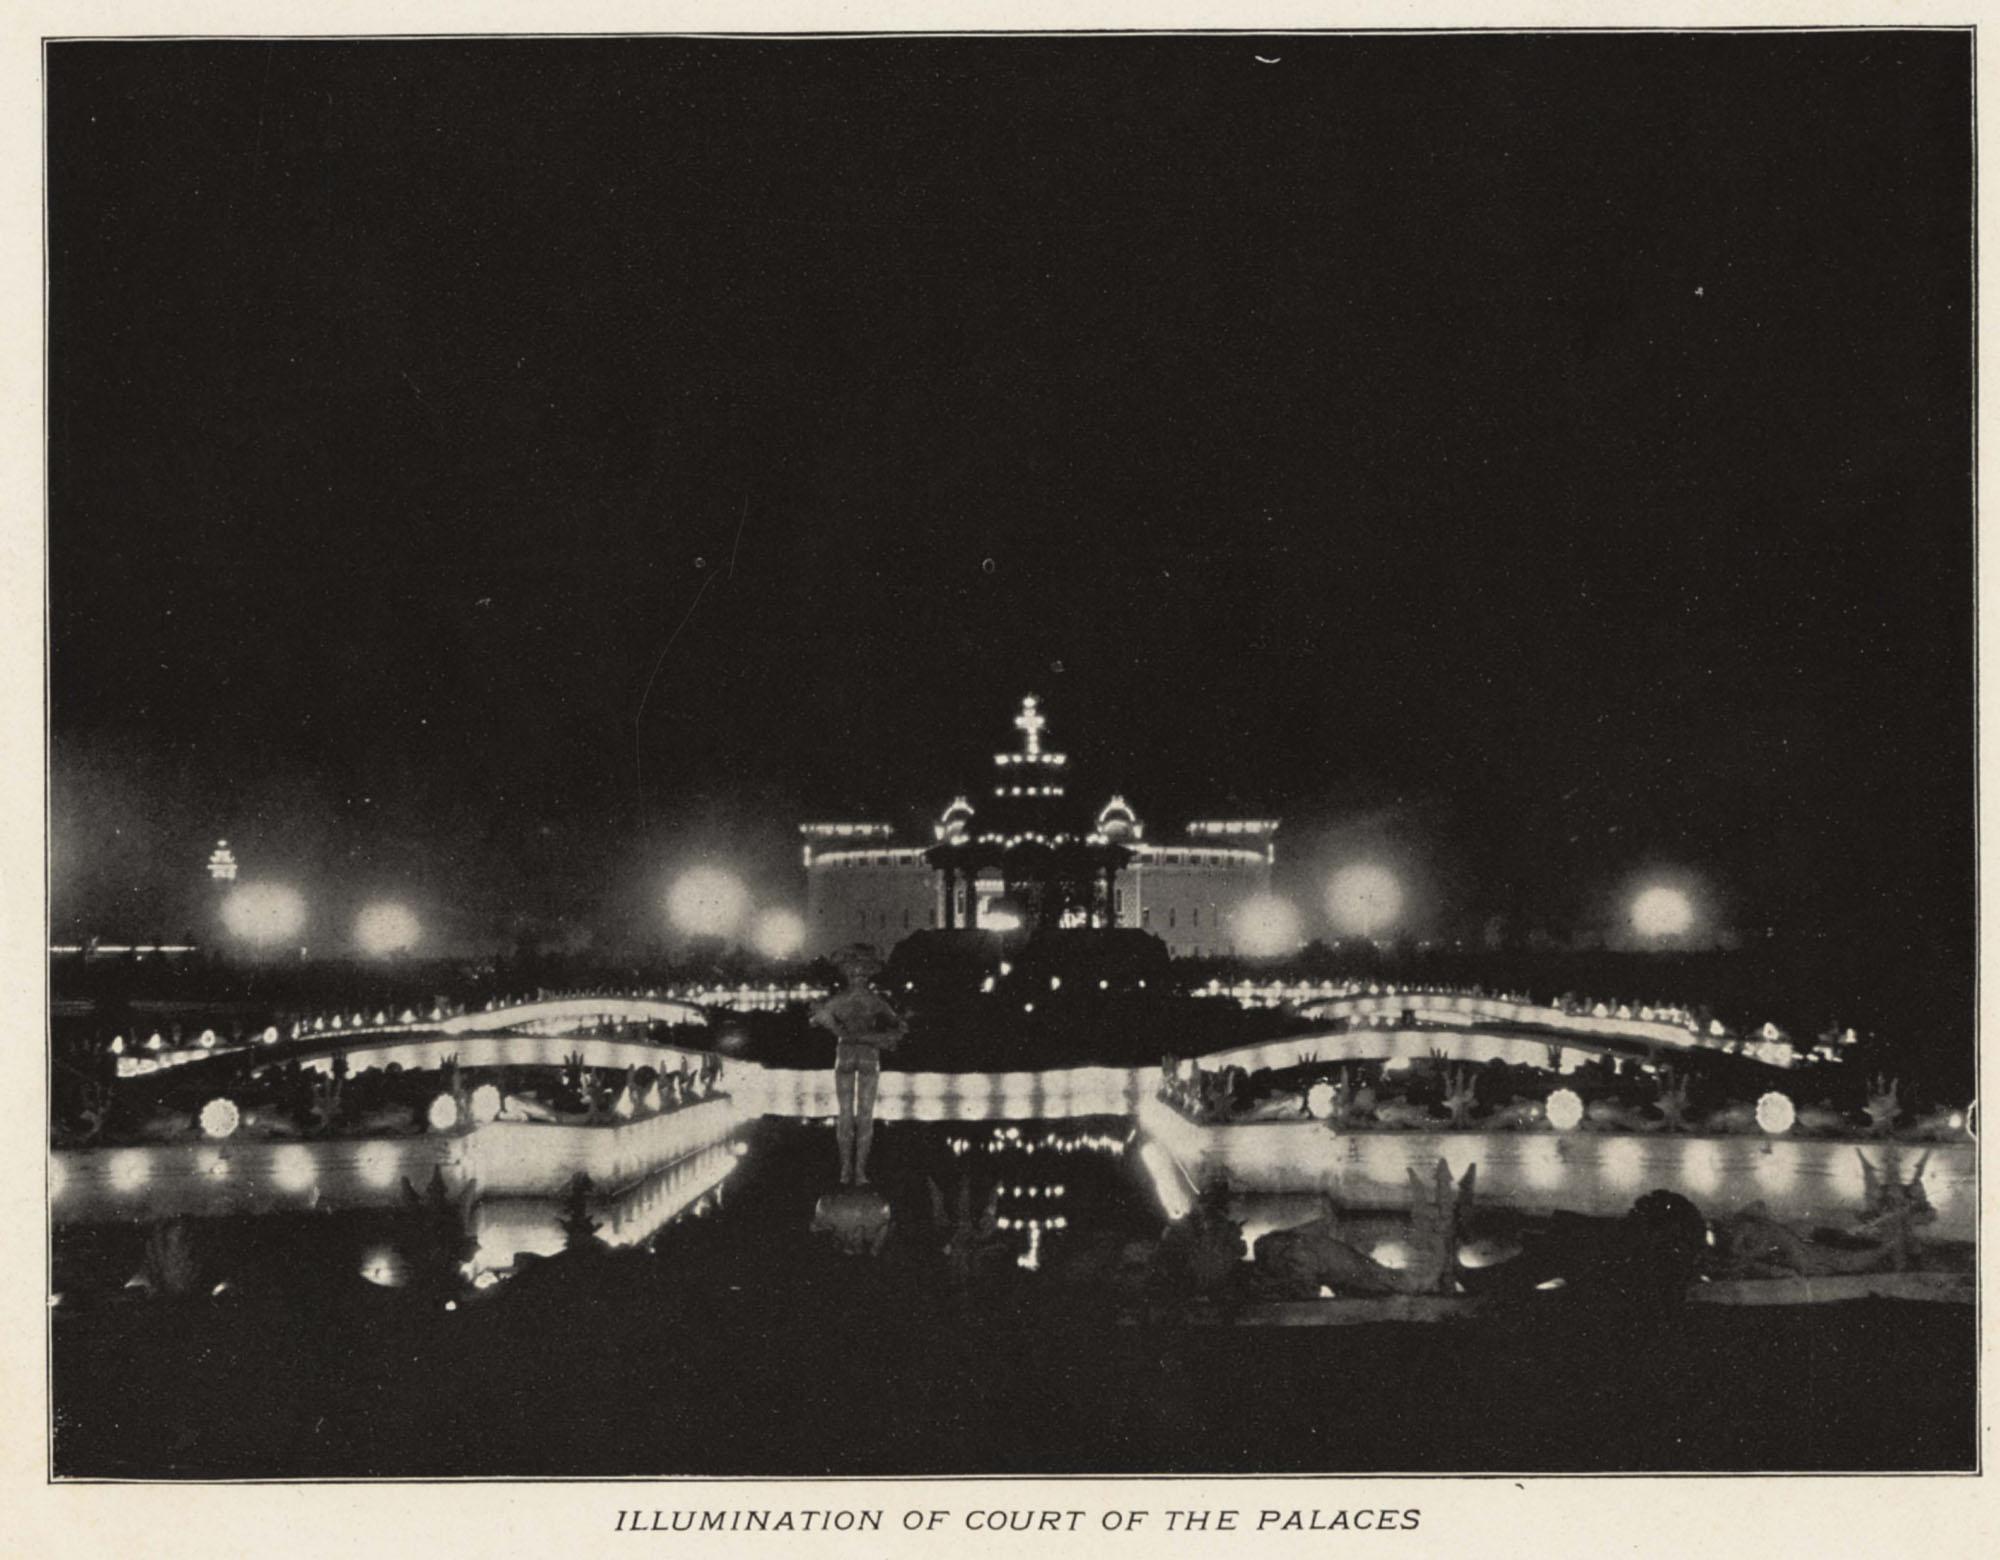 Illumination of Court of the Palaces